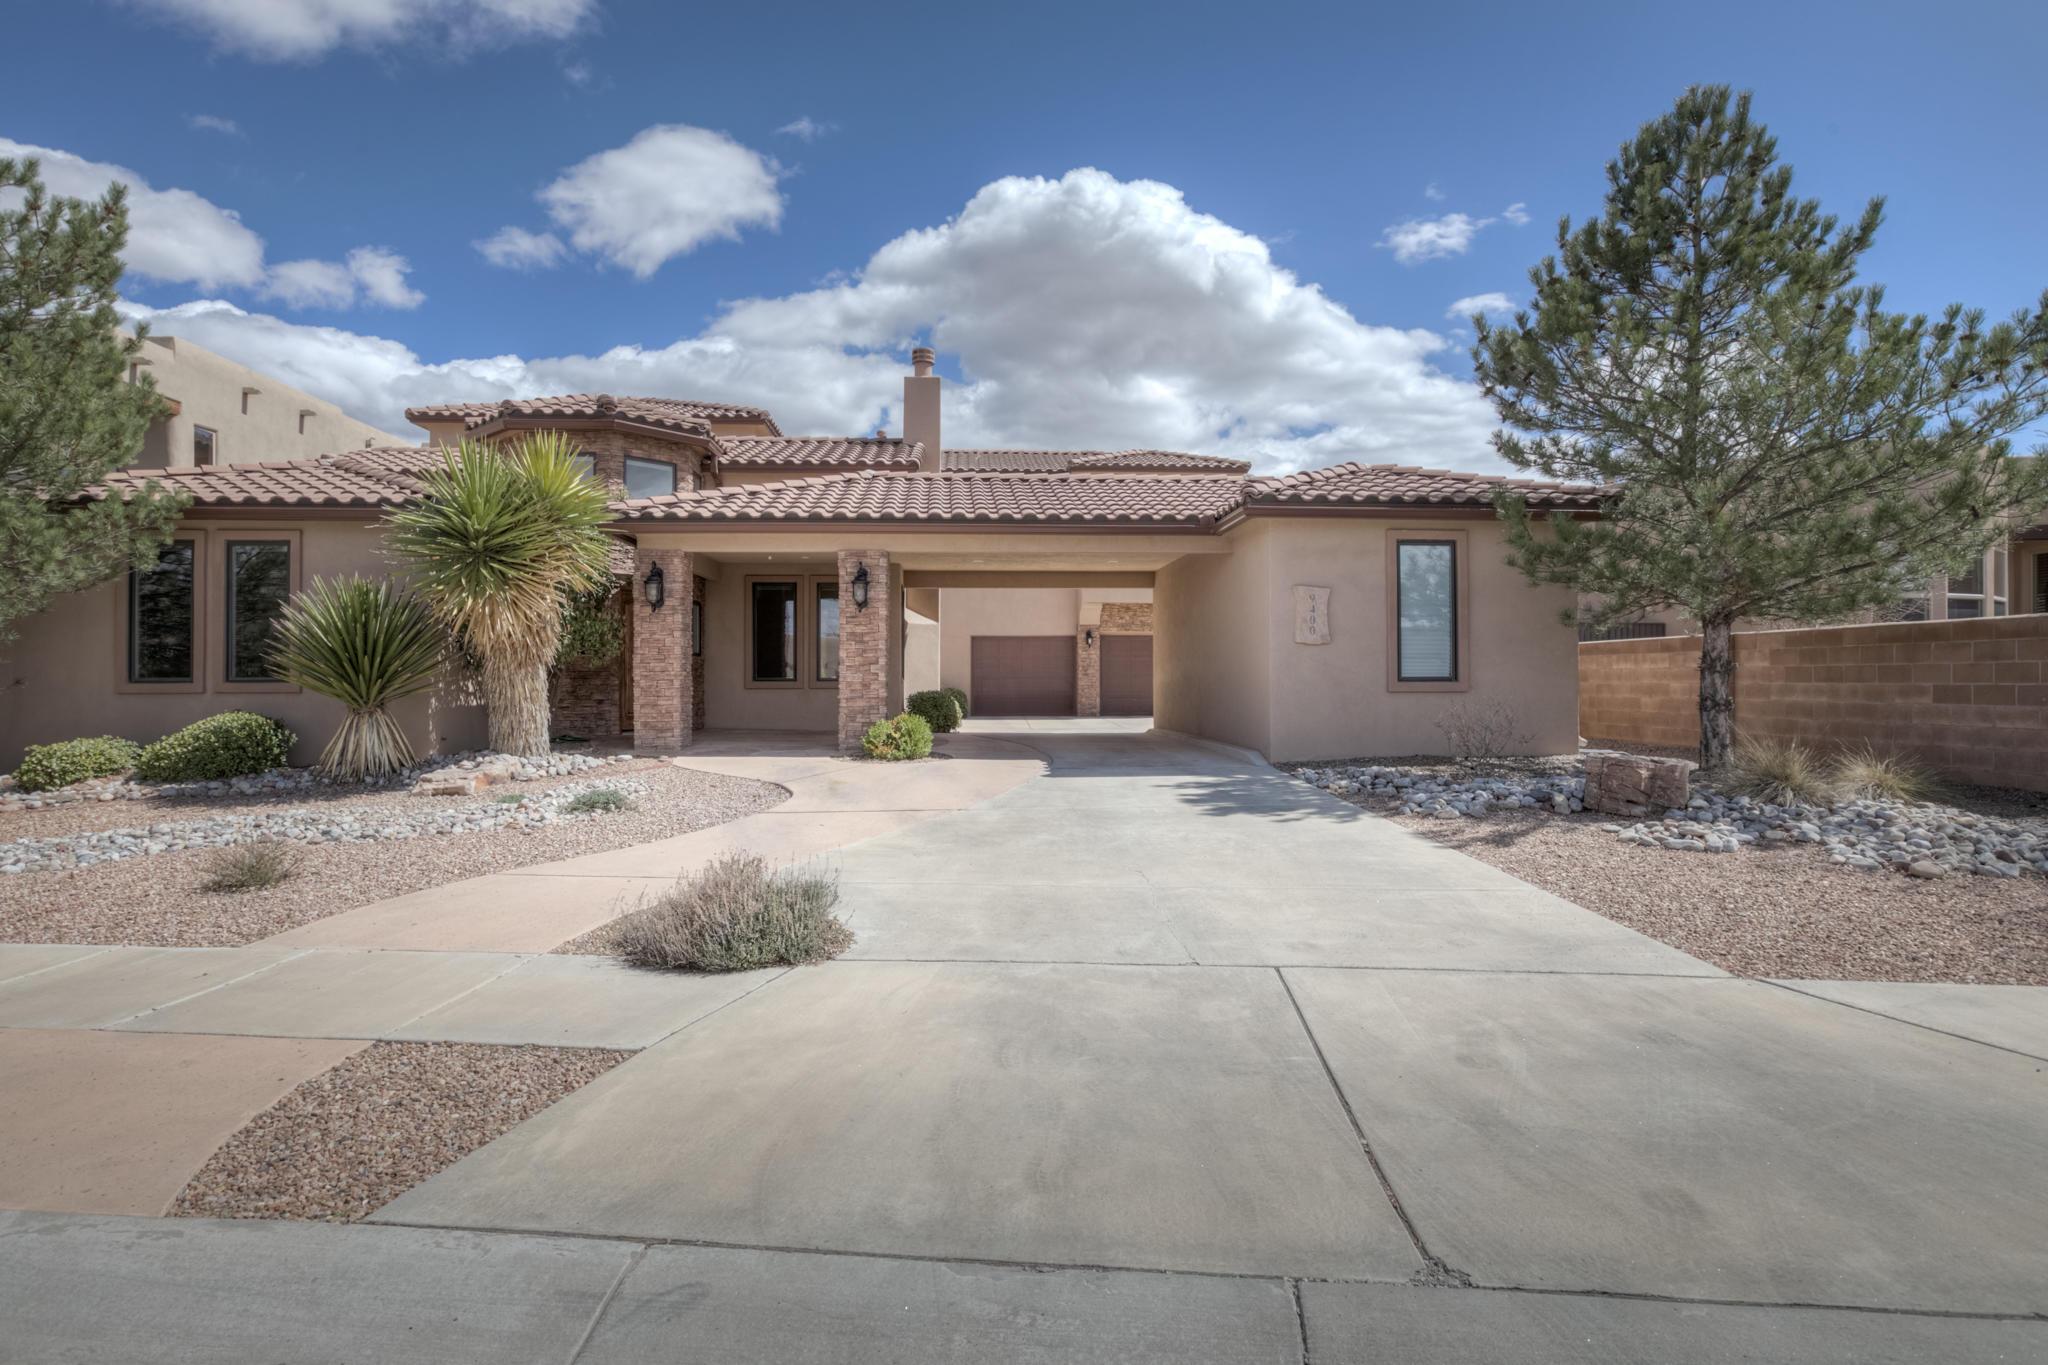 9400 BEAR MOUNTAIN Trail NE Property Photo - Albuquerque, NM real estate listing